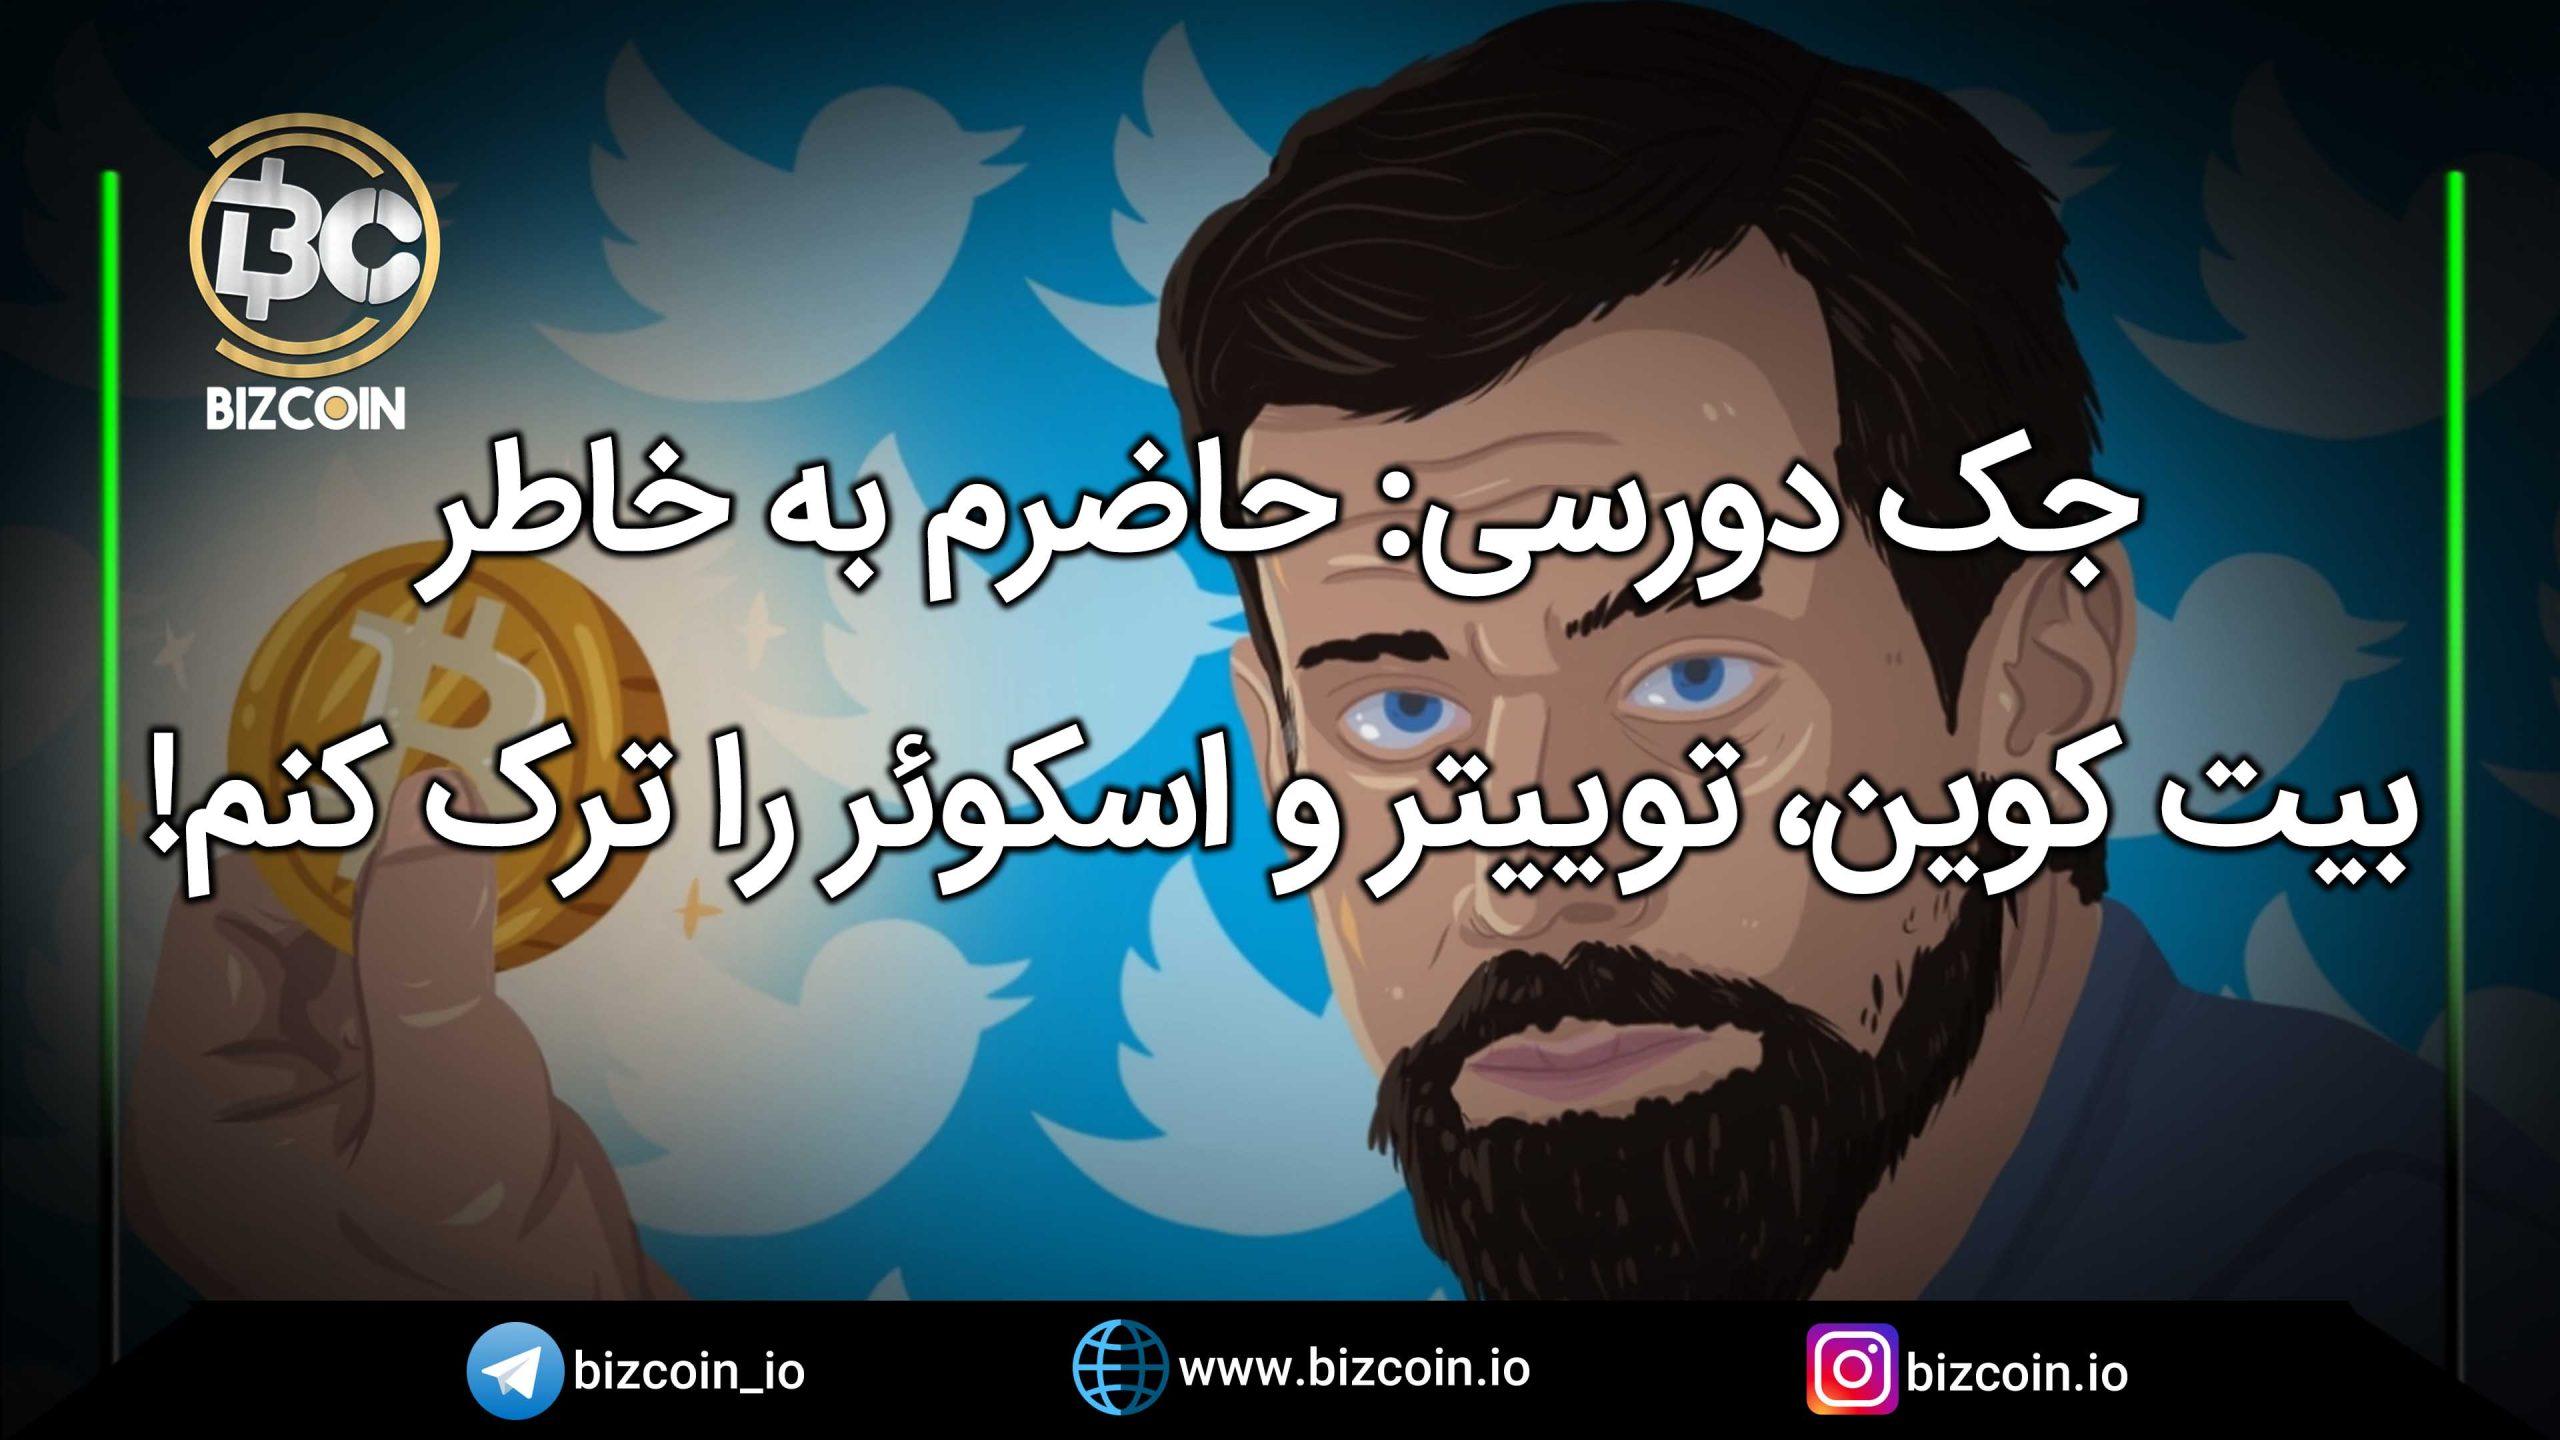 جک دورسی: حاضرم به خاطر بیت کوین، توییتر و اسکوئر را ترک کنم!